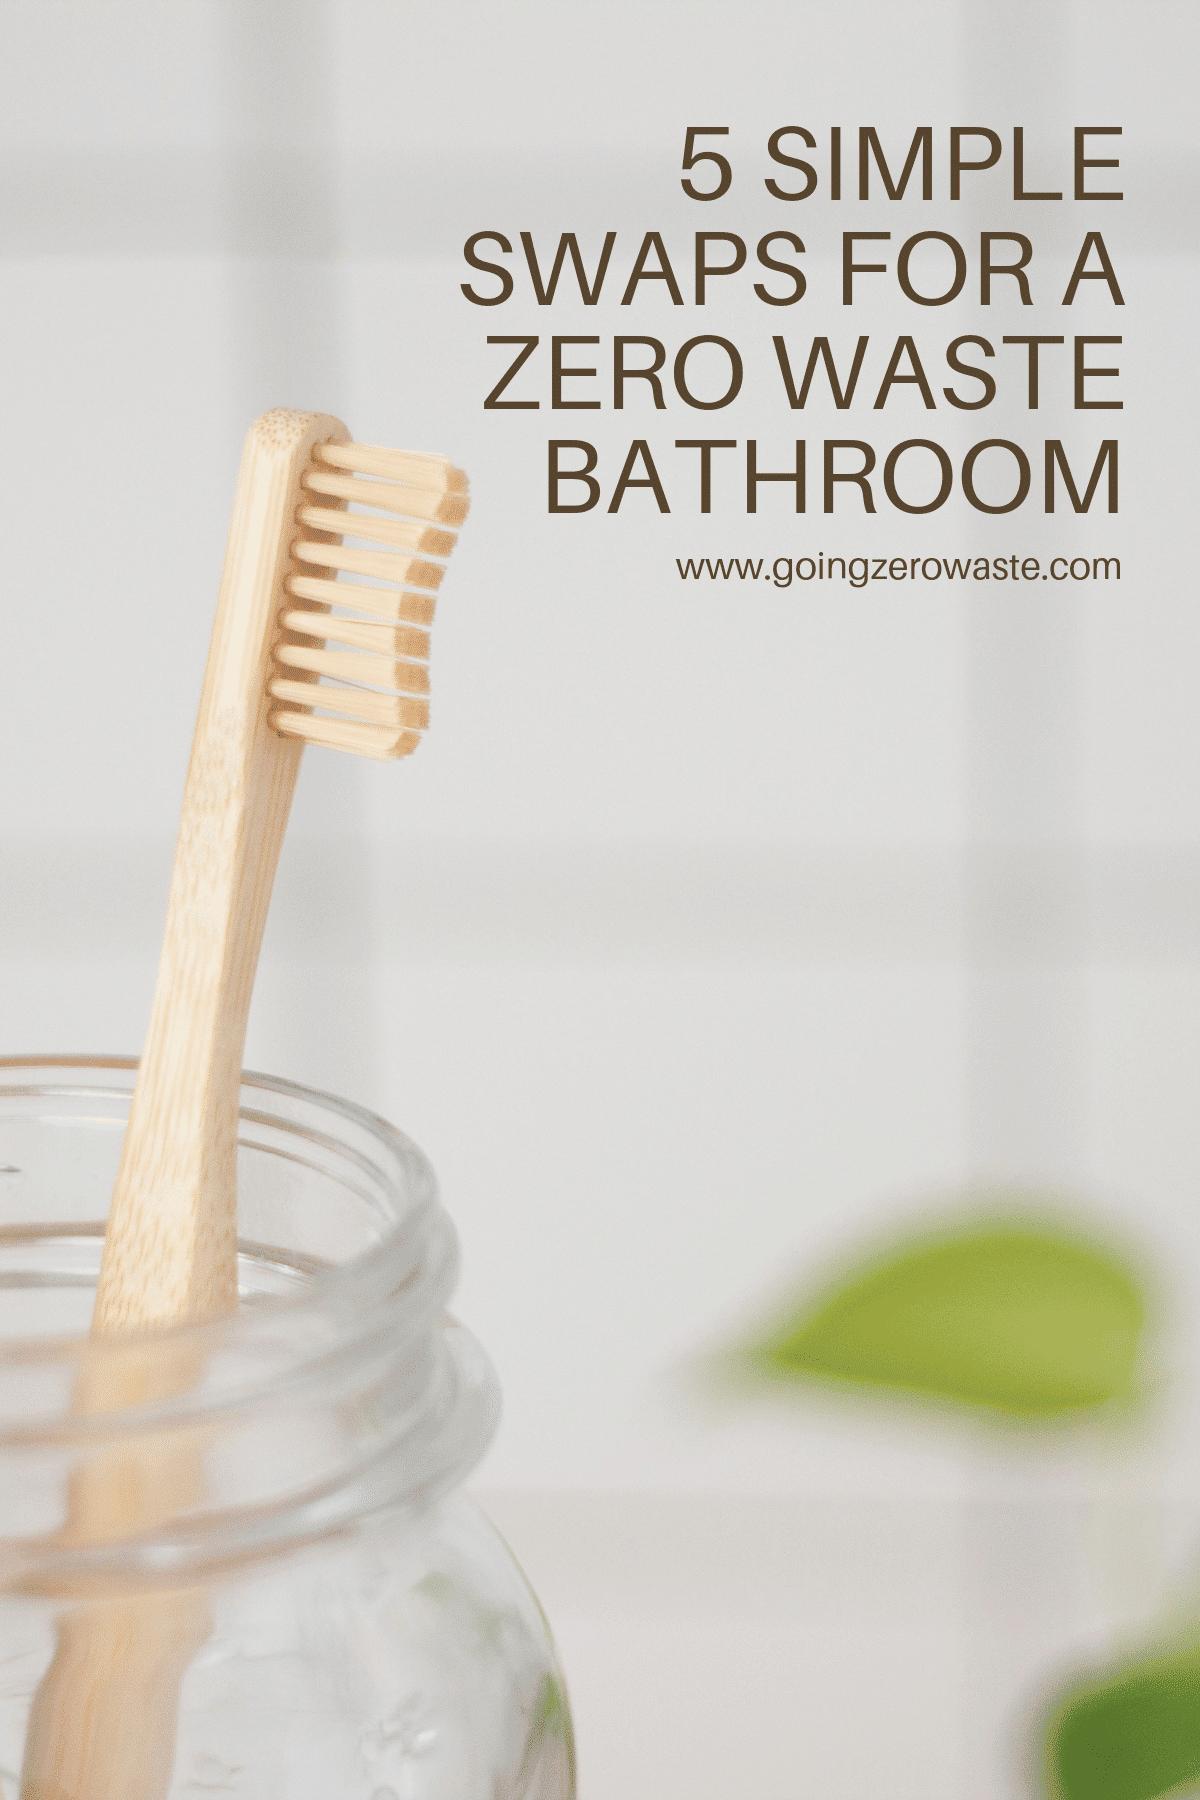 5 Simple Swaps for a Zero Waste Bathroom